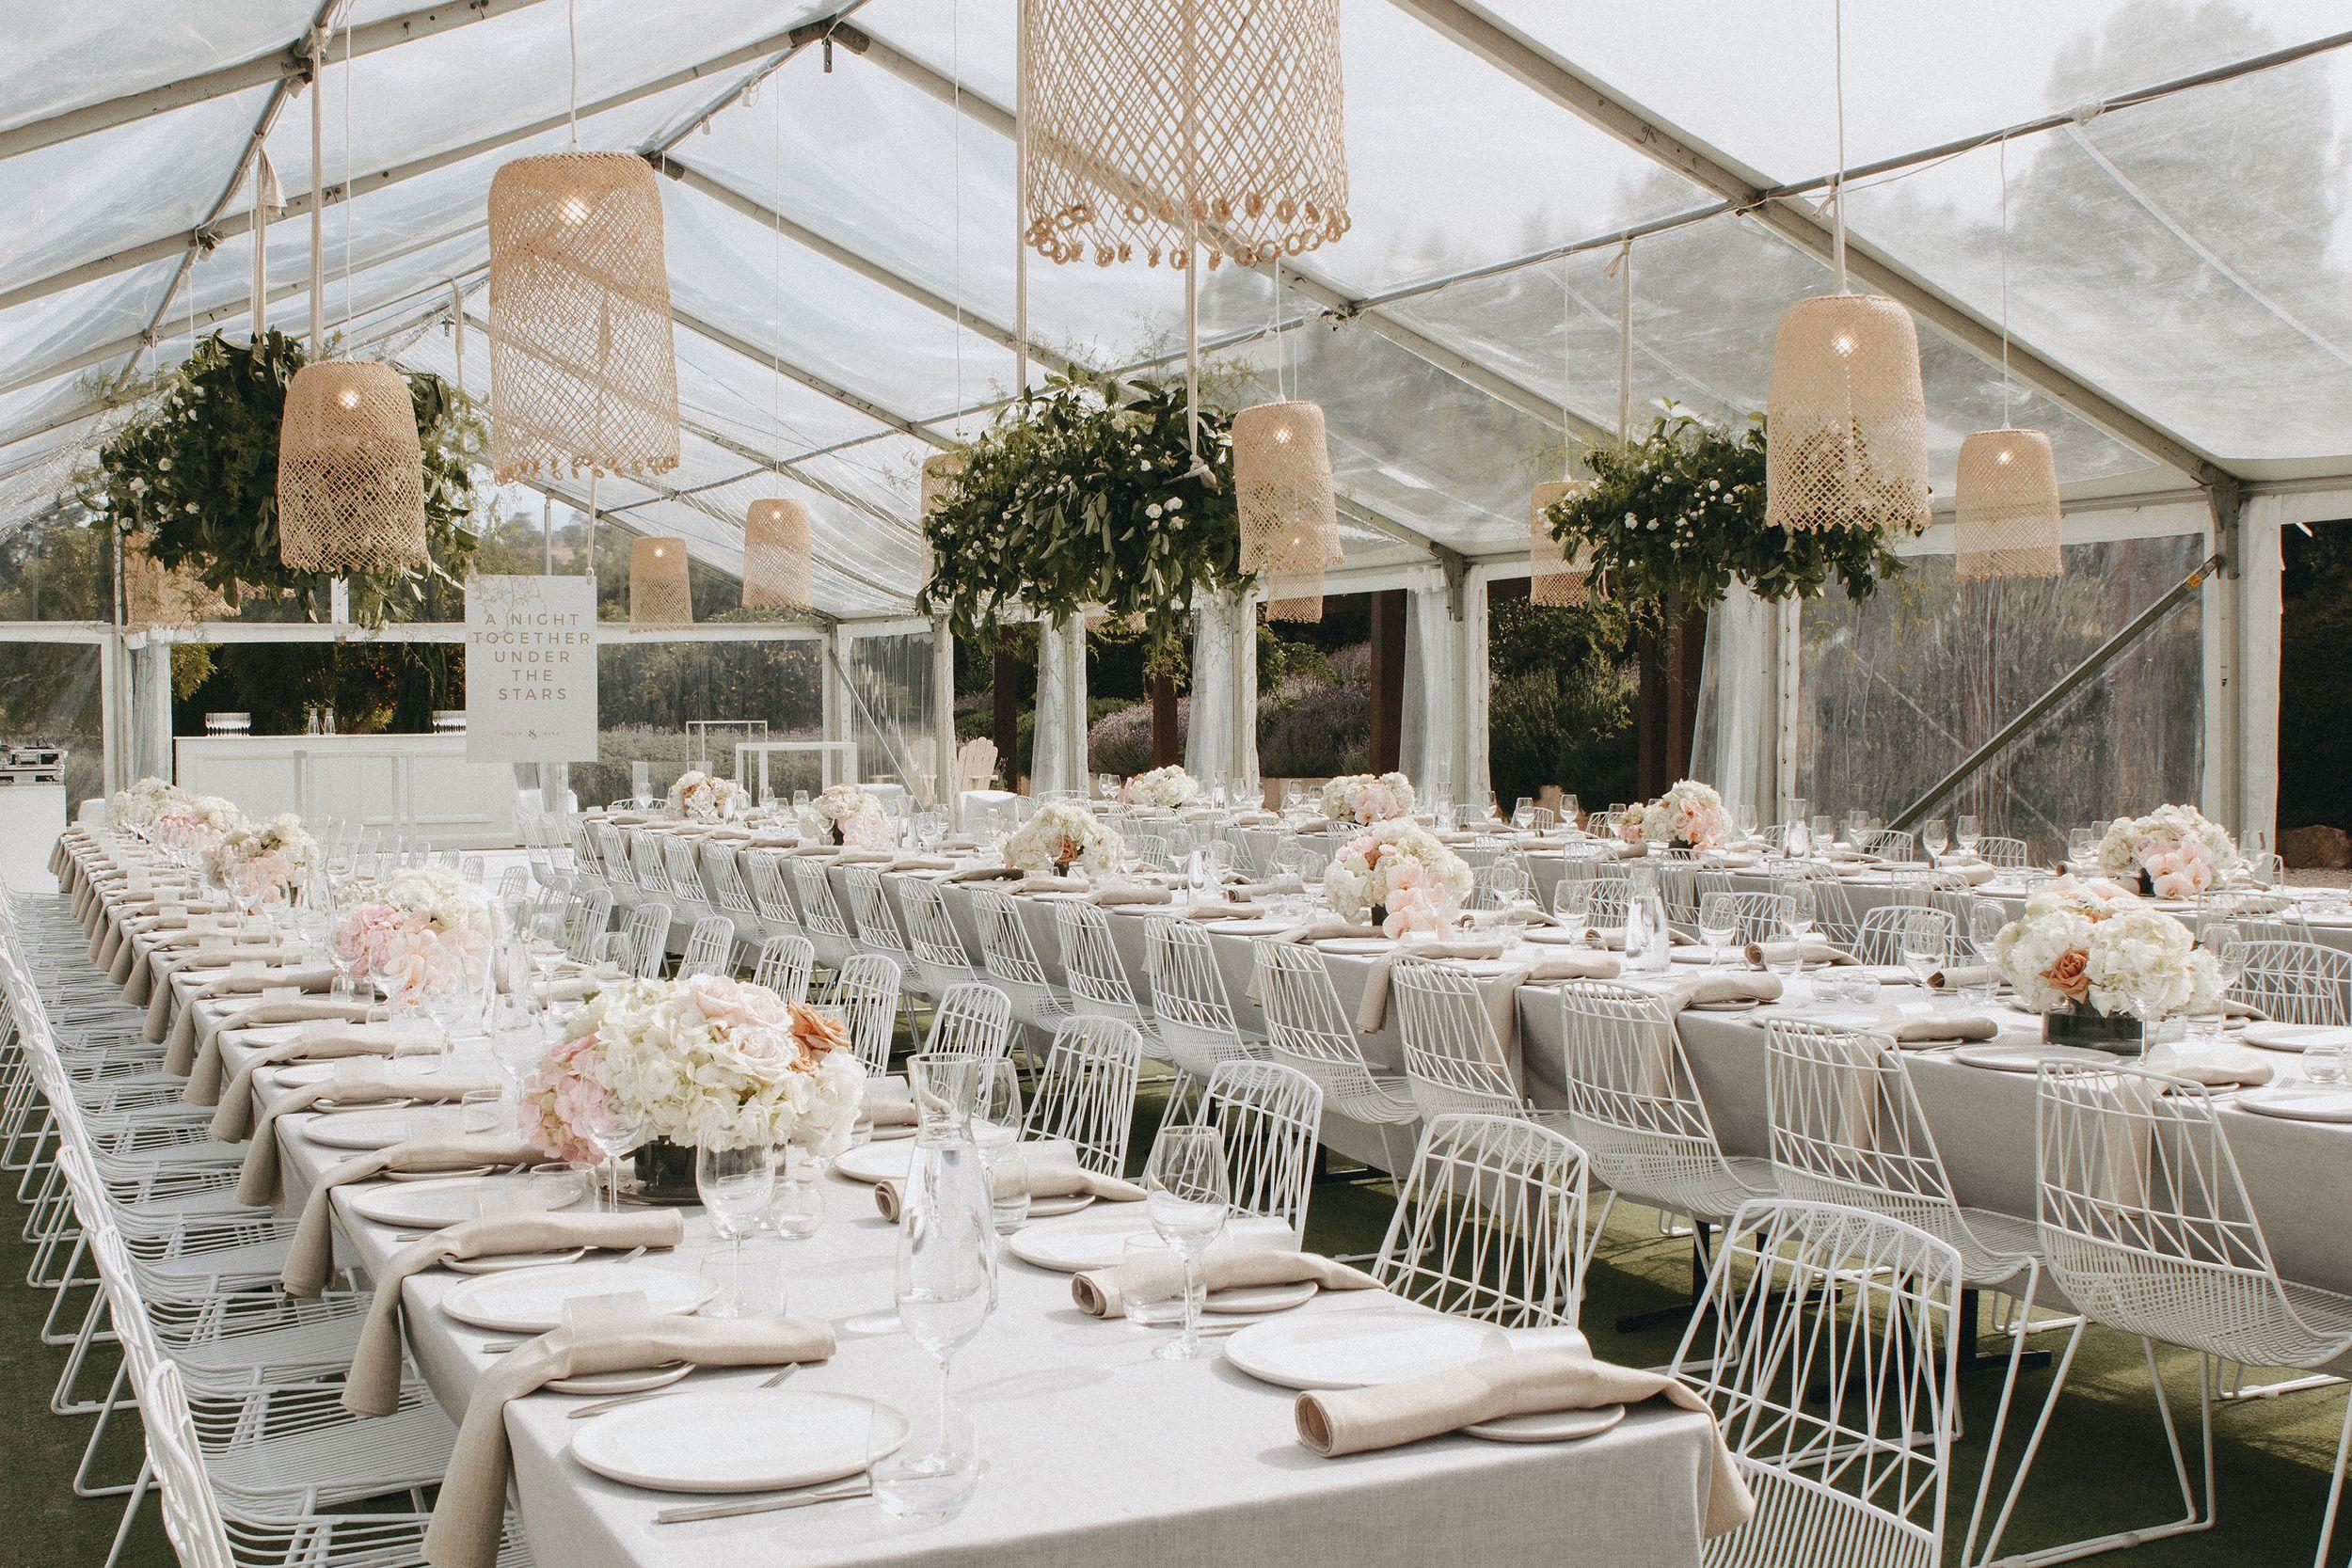 H_A — HYGGE Tent decorations, Wedding venue decorations